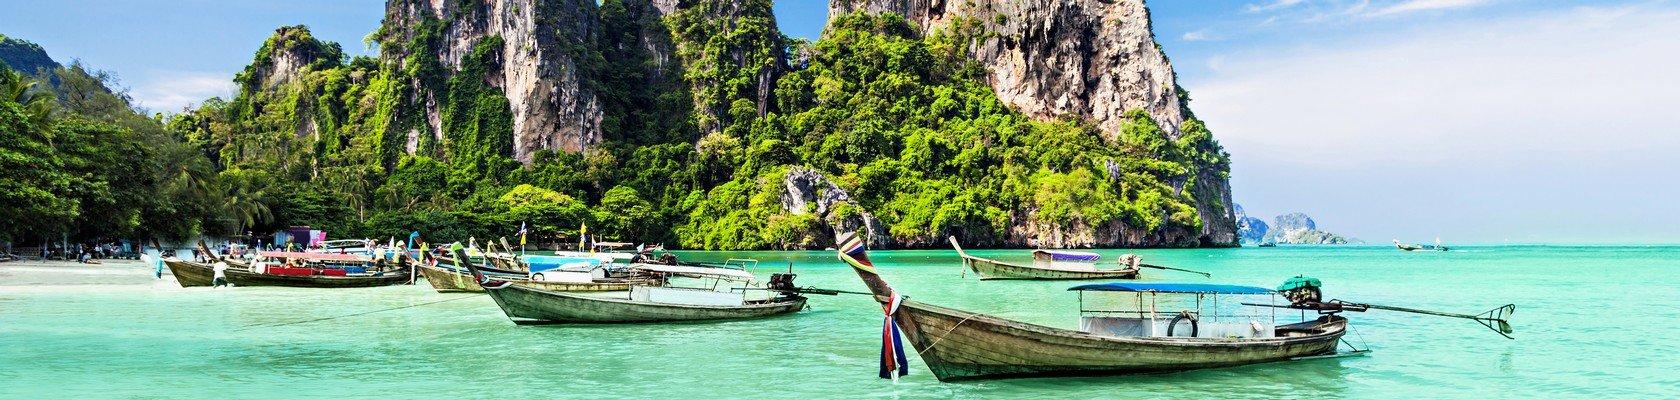 Gezellige stranden van Phuket